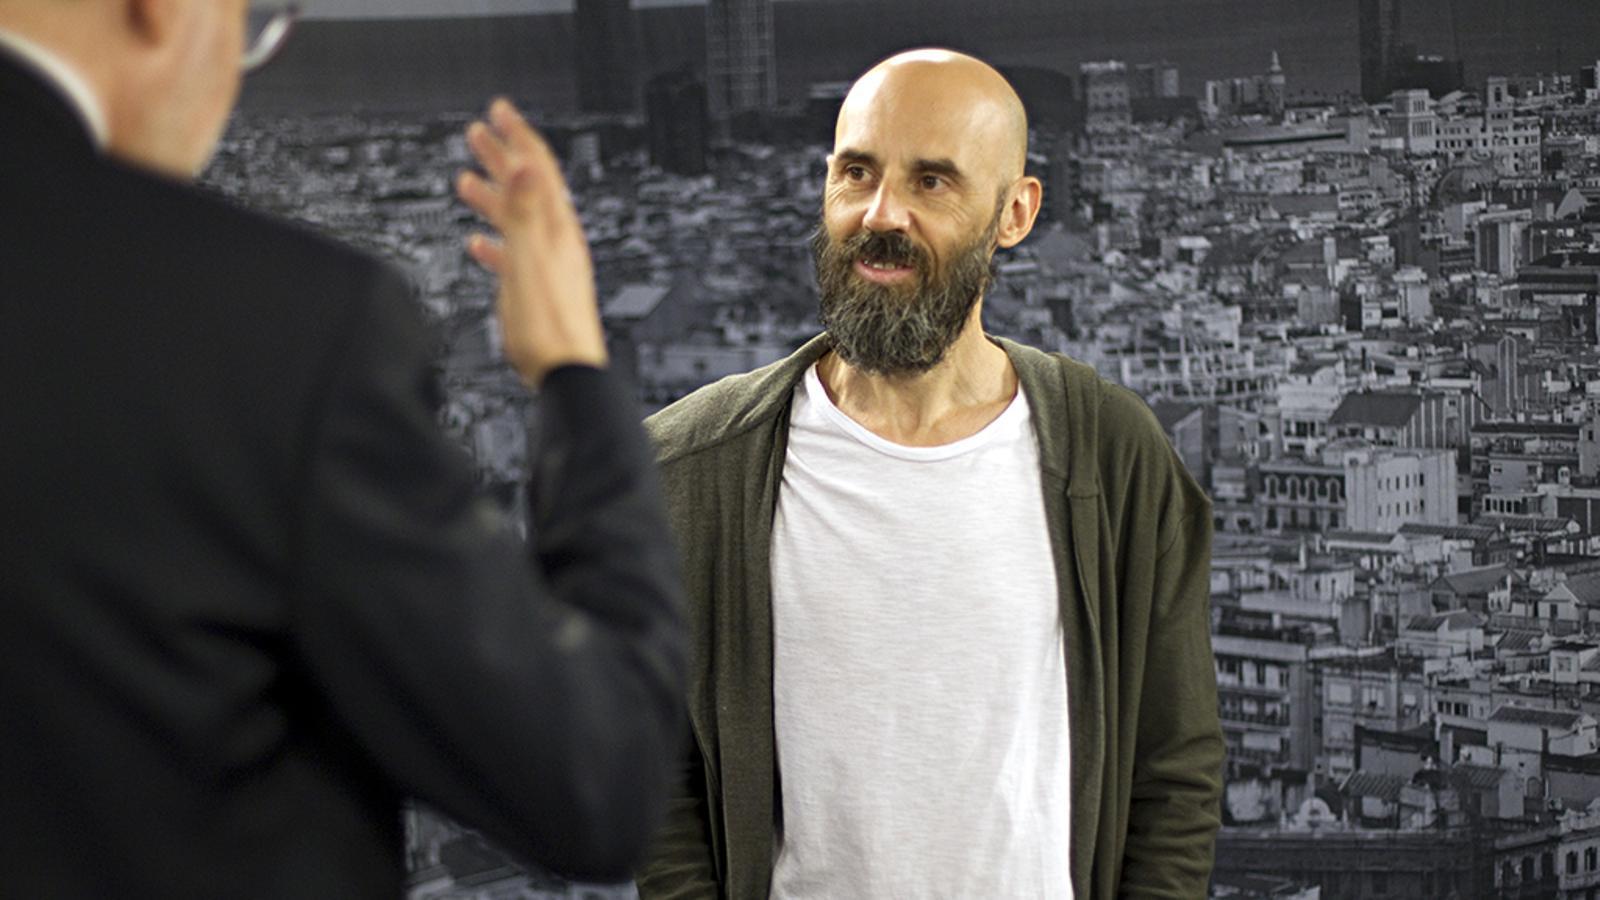 Entrevista d'Antoni Bassas a Jordi Parramon